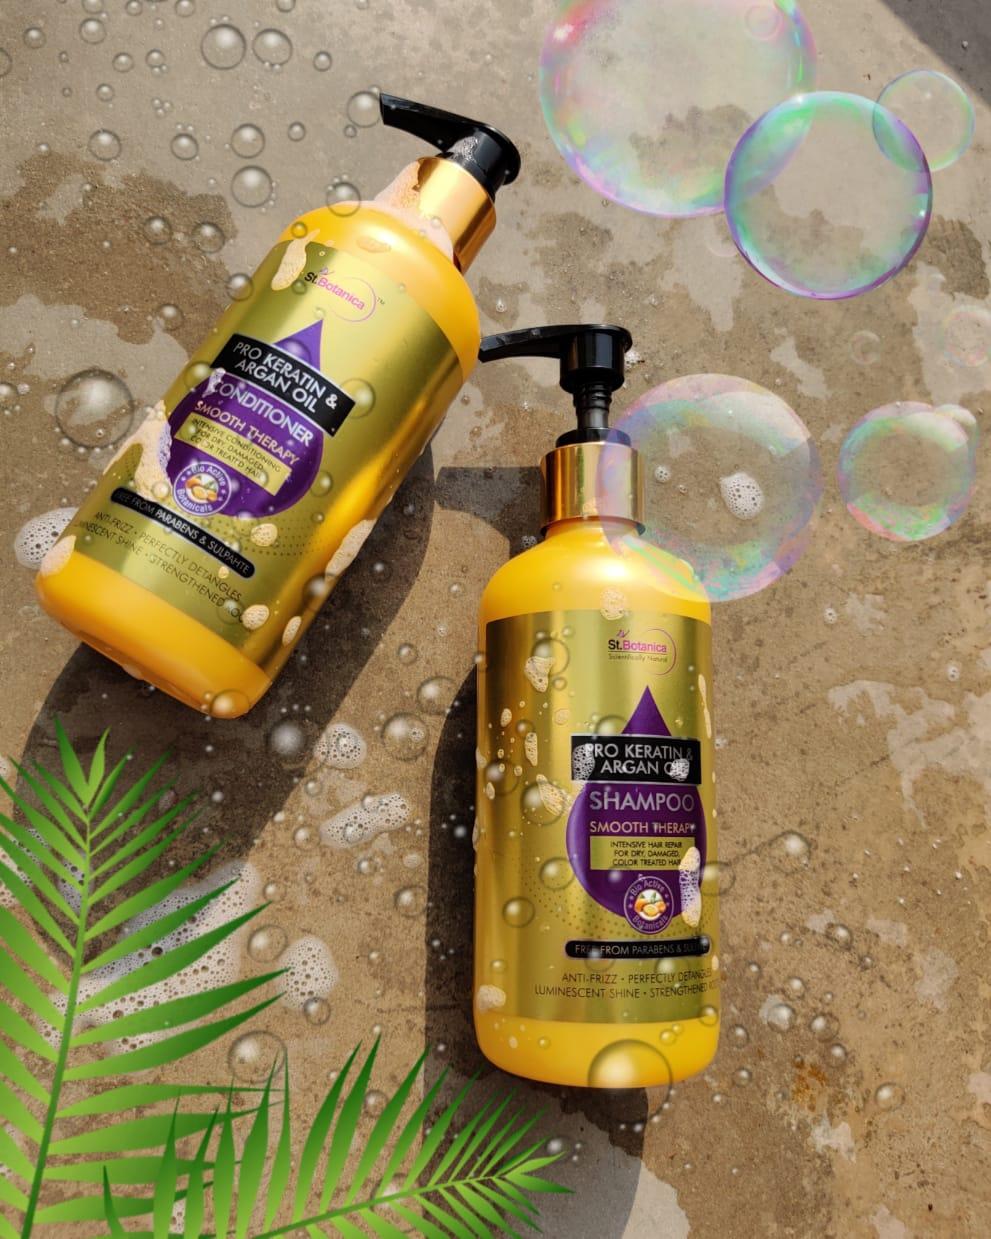 St.Botanica Pro Keratin & Argan Oil Shampoo-Best shampoo for dry and frizzy hair-By jagriti2468